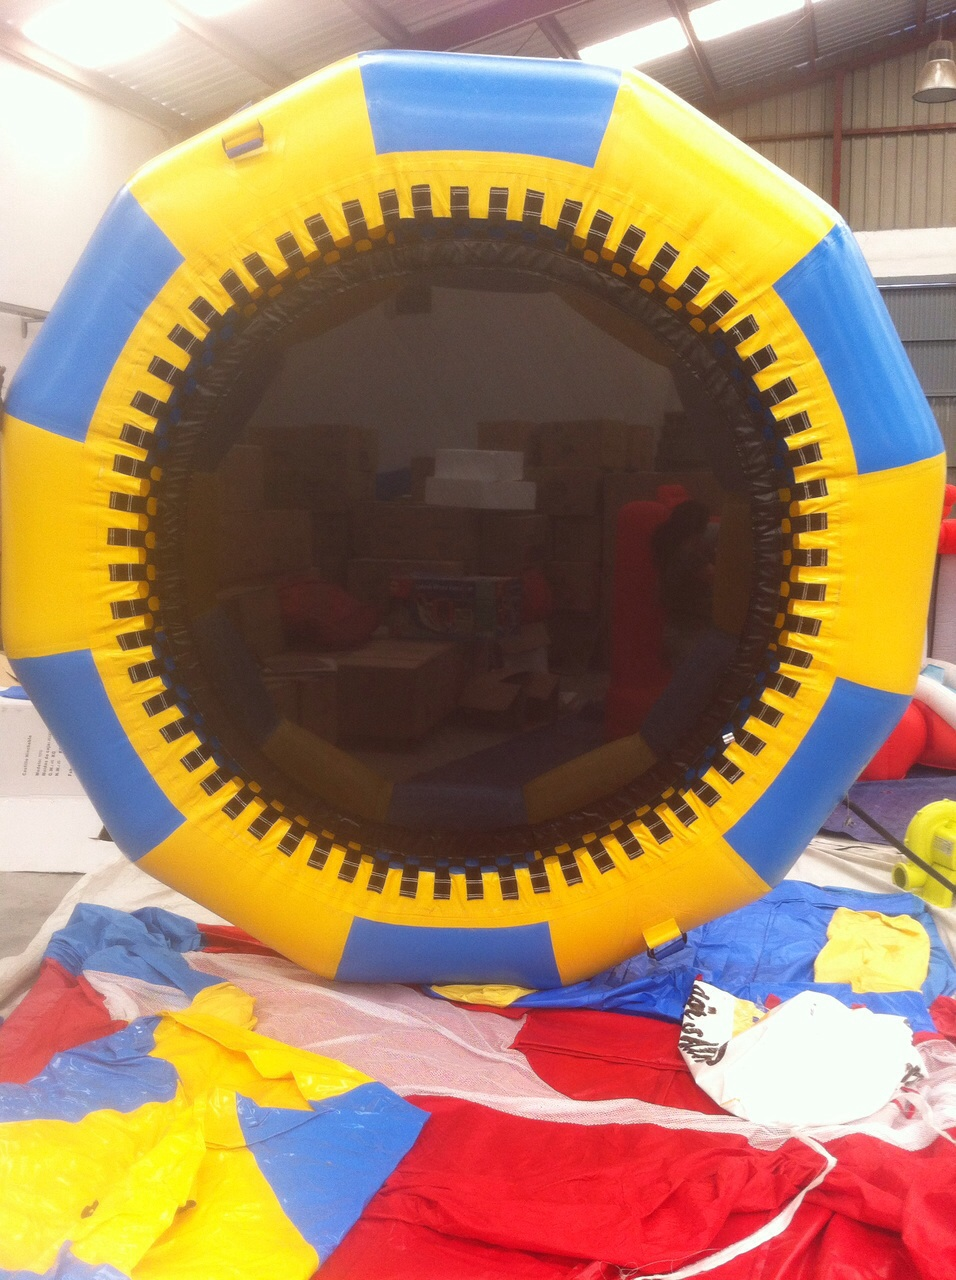 Cama elástica acuática 4 metros de diámetro